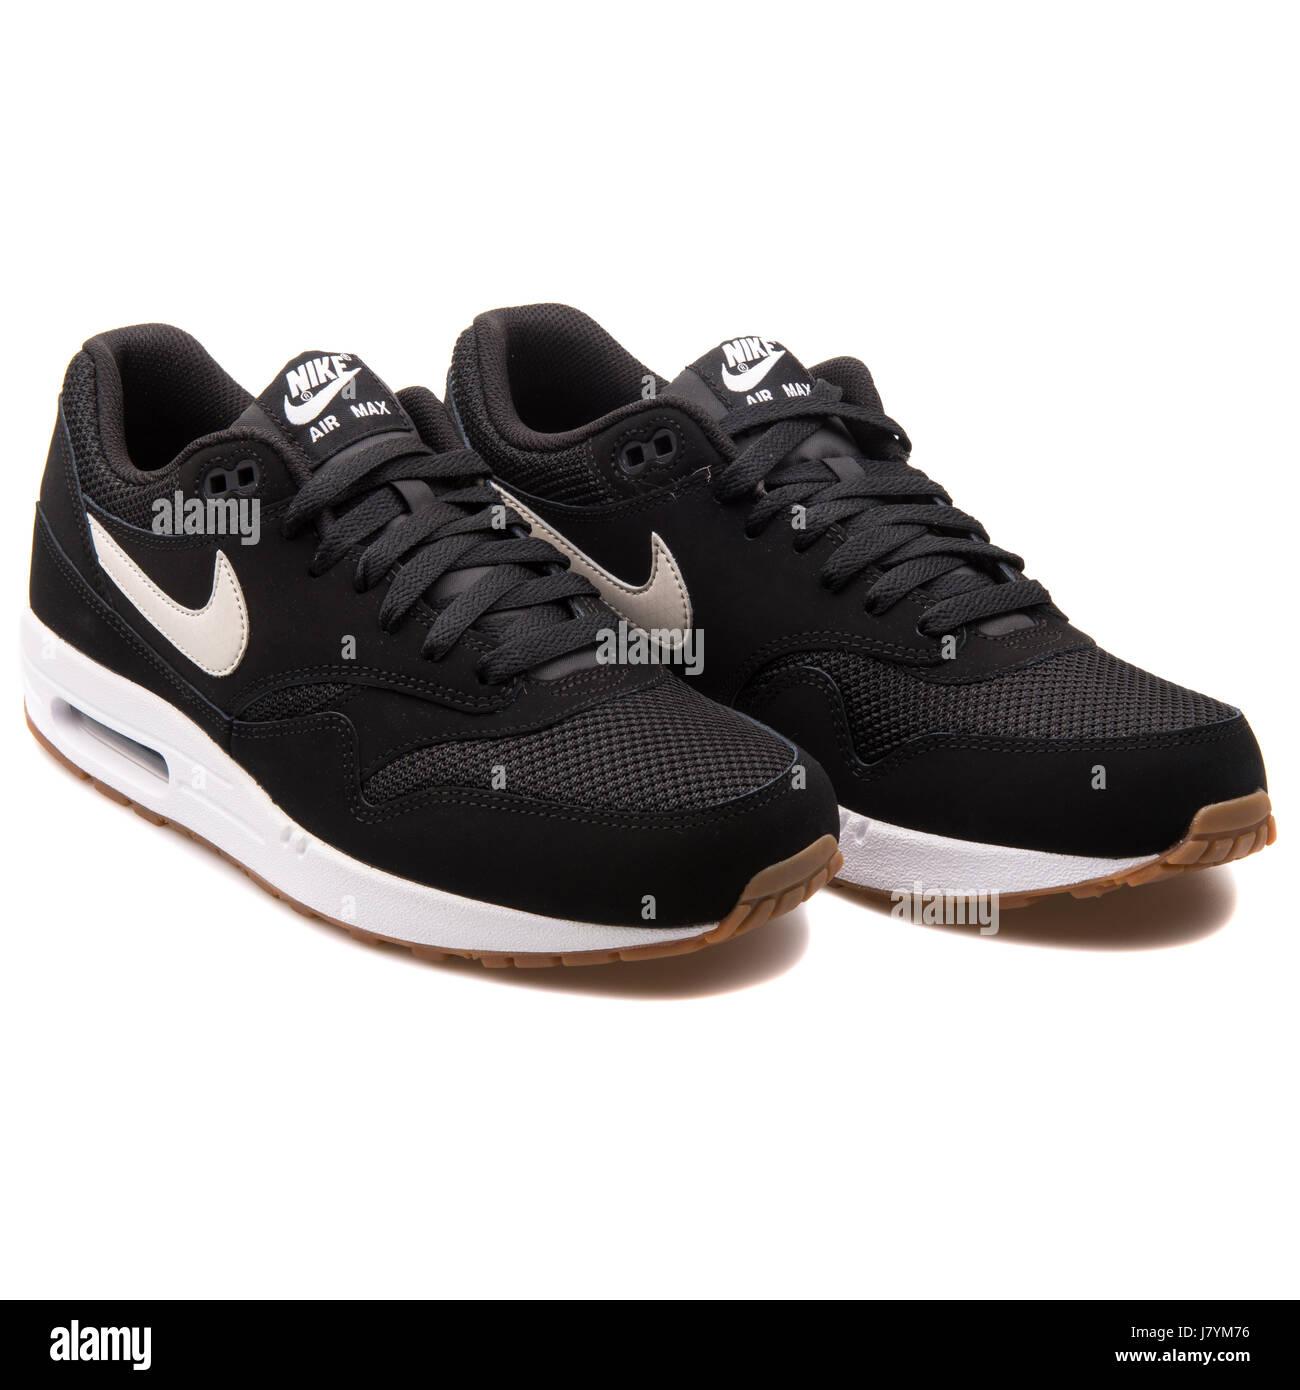 super popular 1341b 128e3 Nike Air Max 1 Essential Men s Black Sports Sneakers - 537383-026